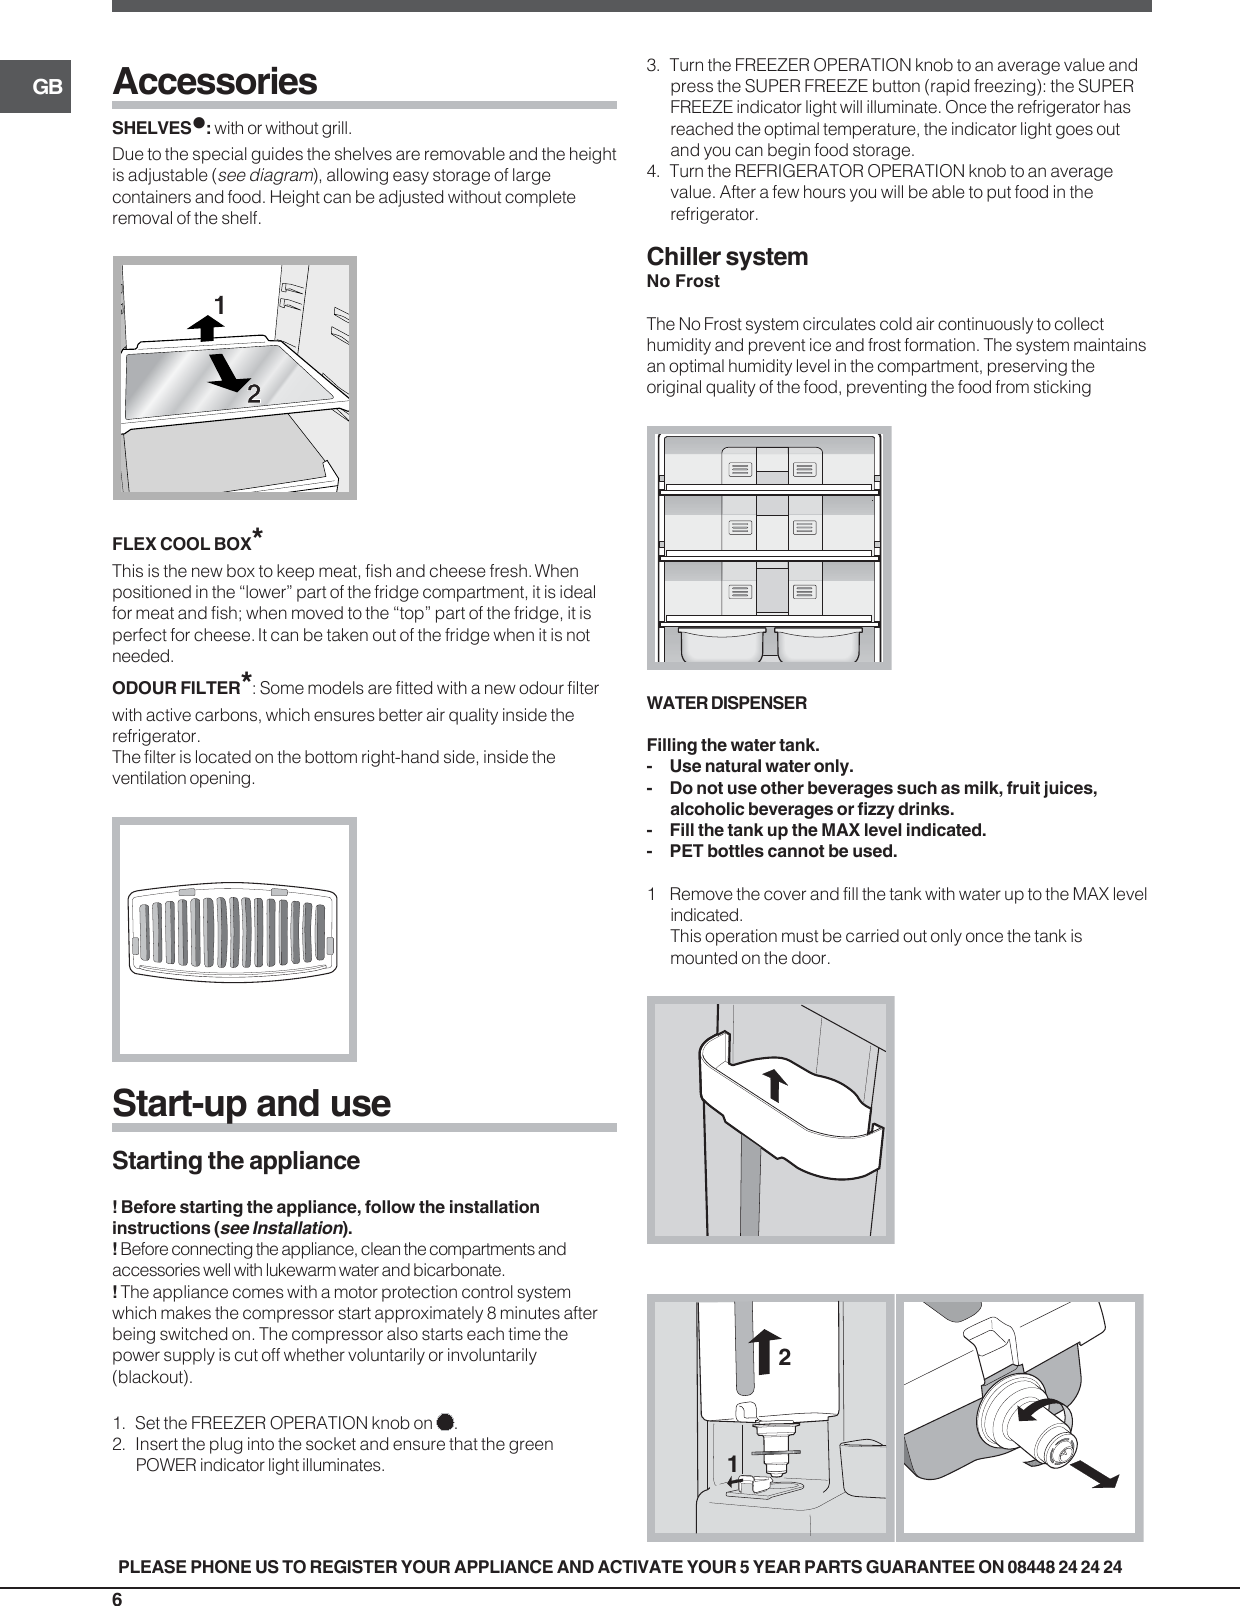 Indesit Refrigerator Ban 40 Users Manual 19508693000gb tr